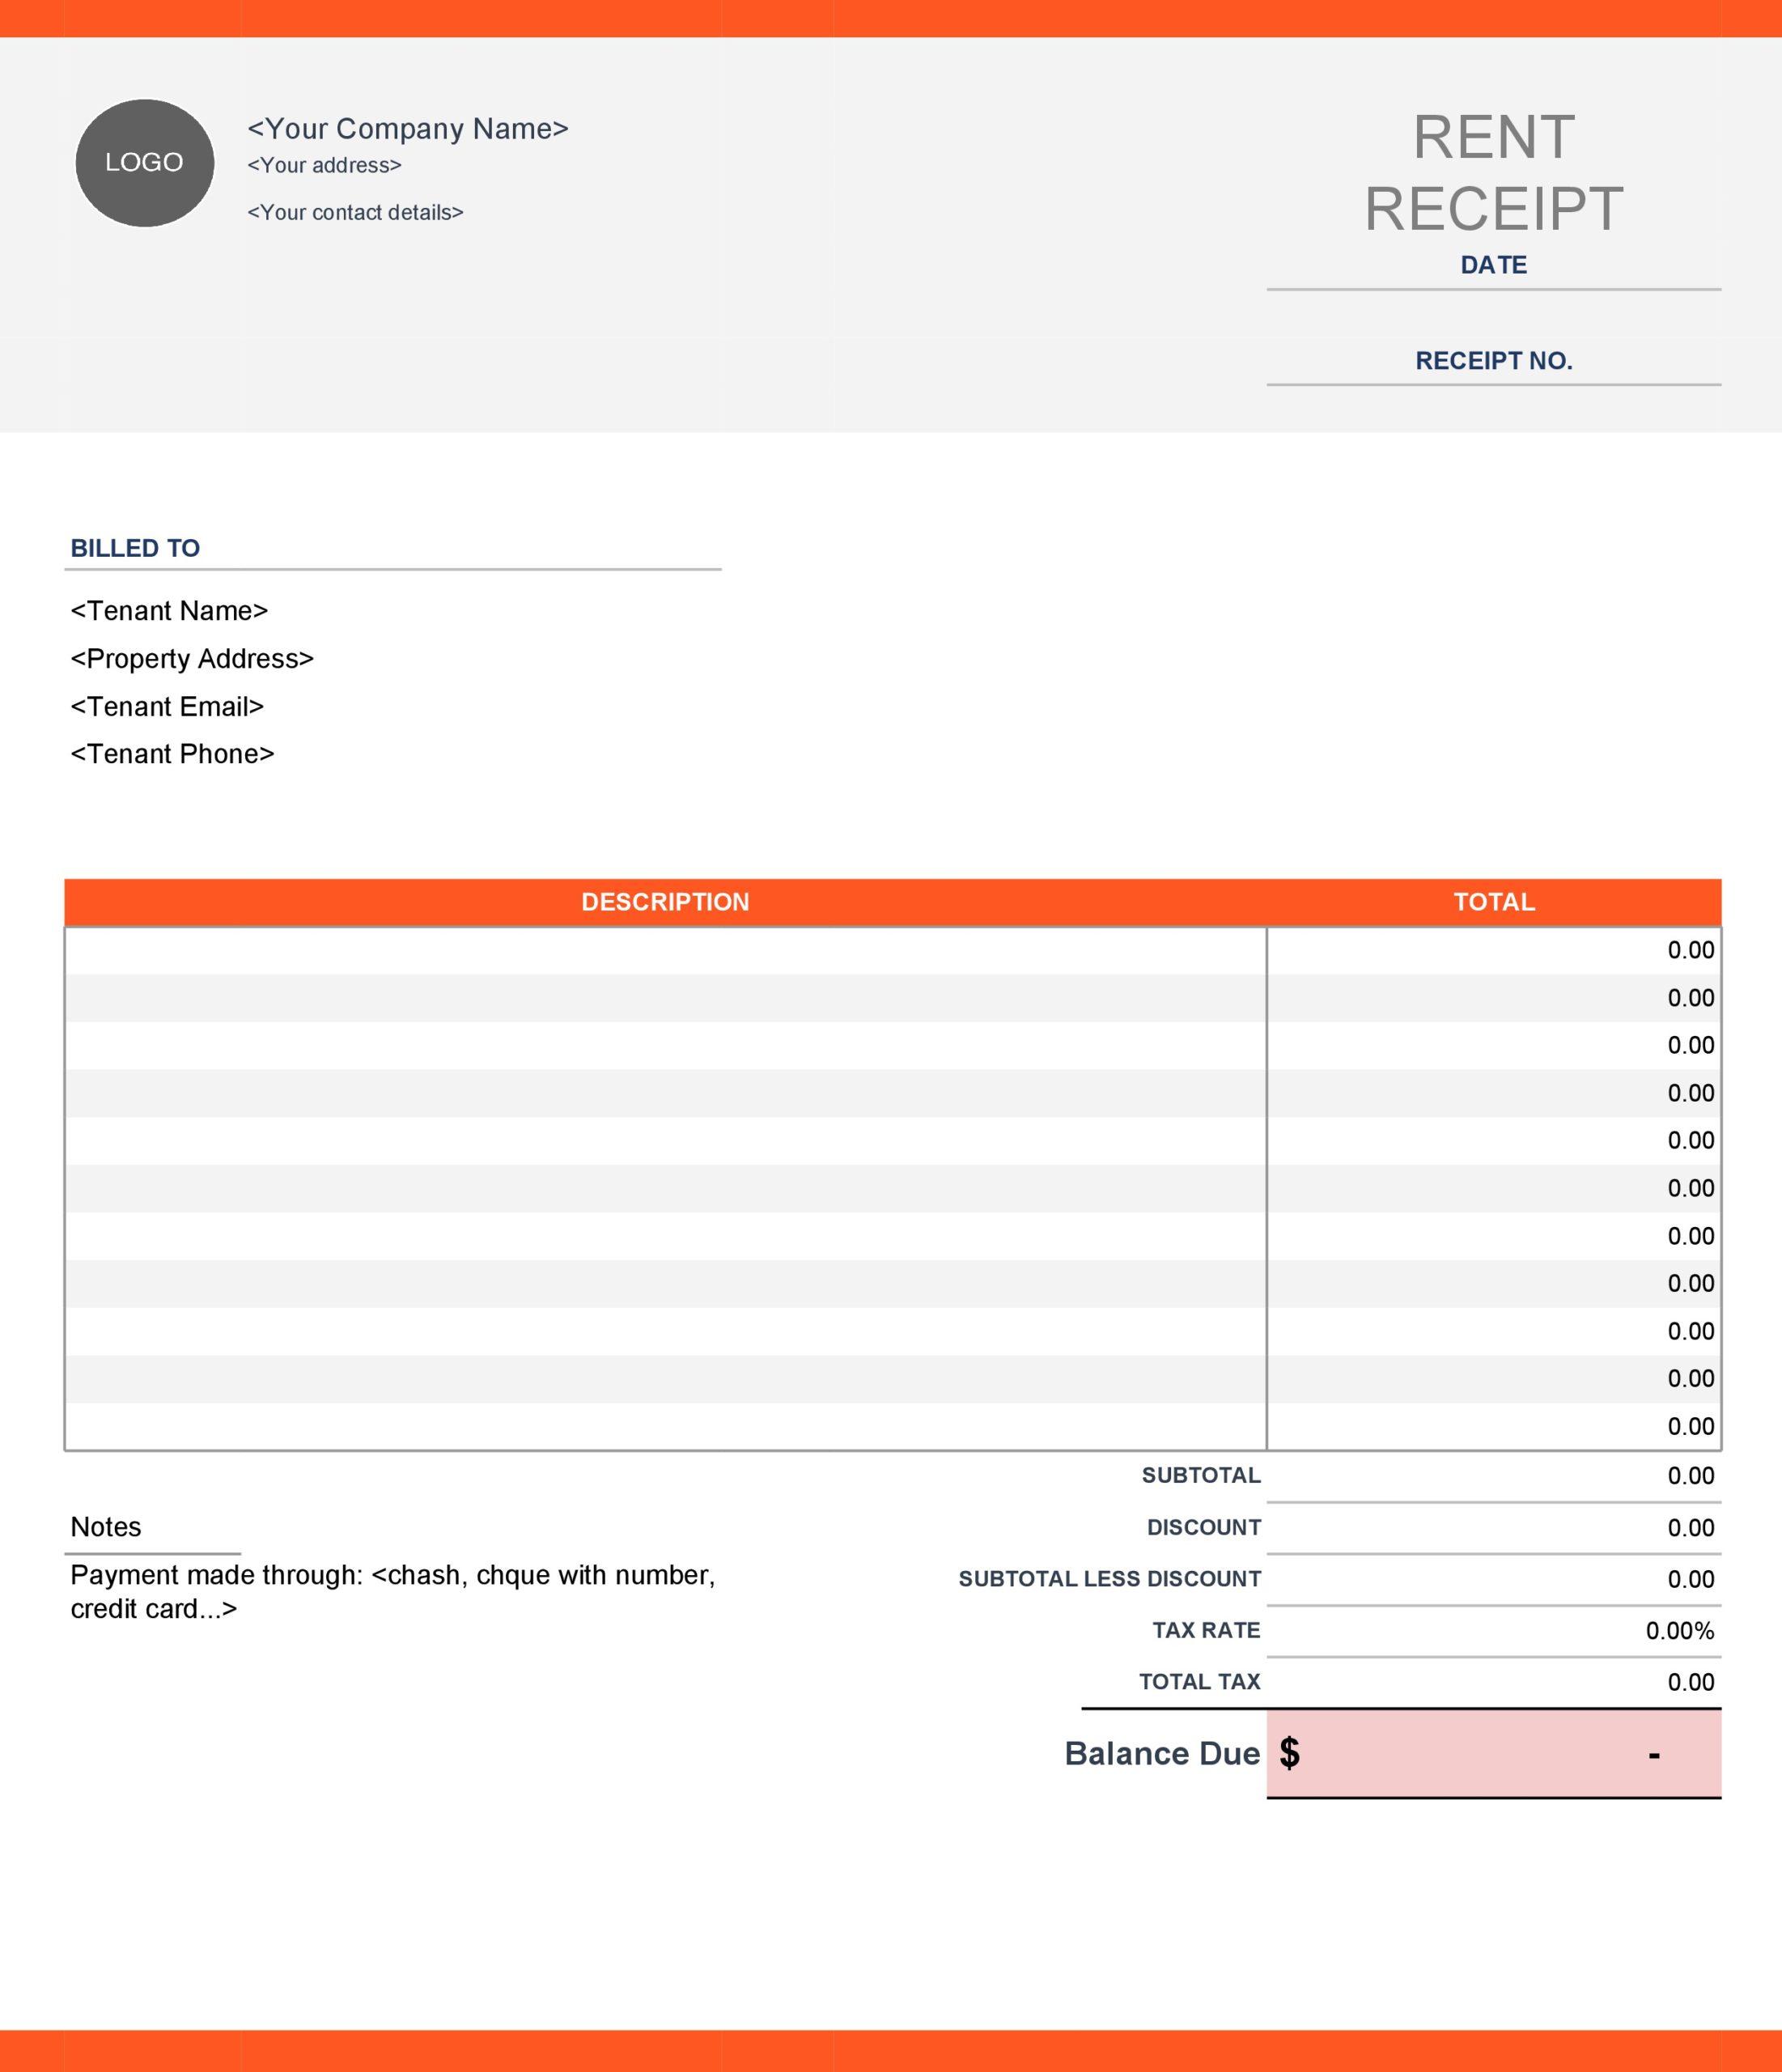 rent receipt 03